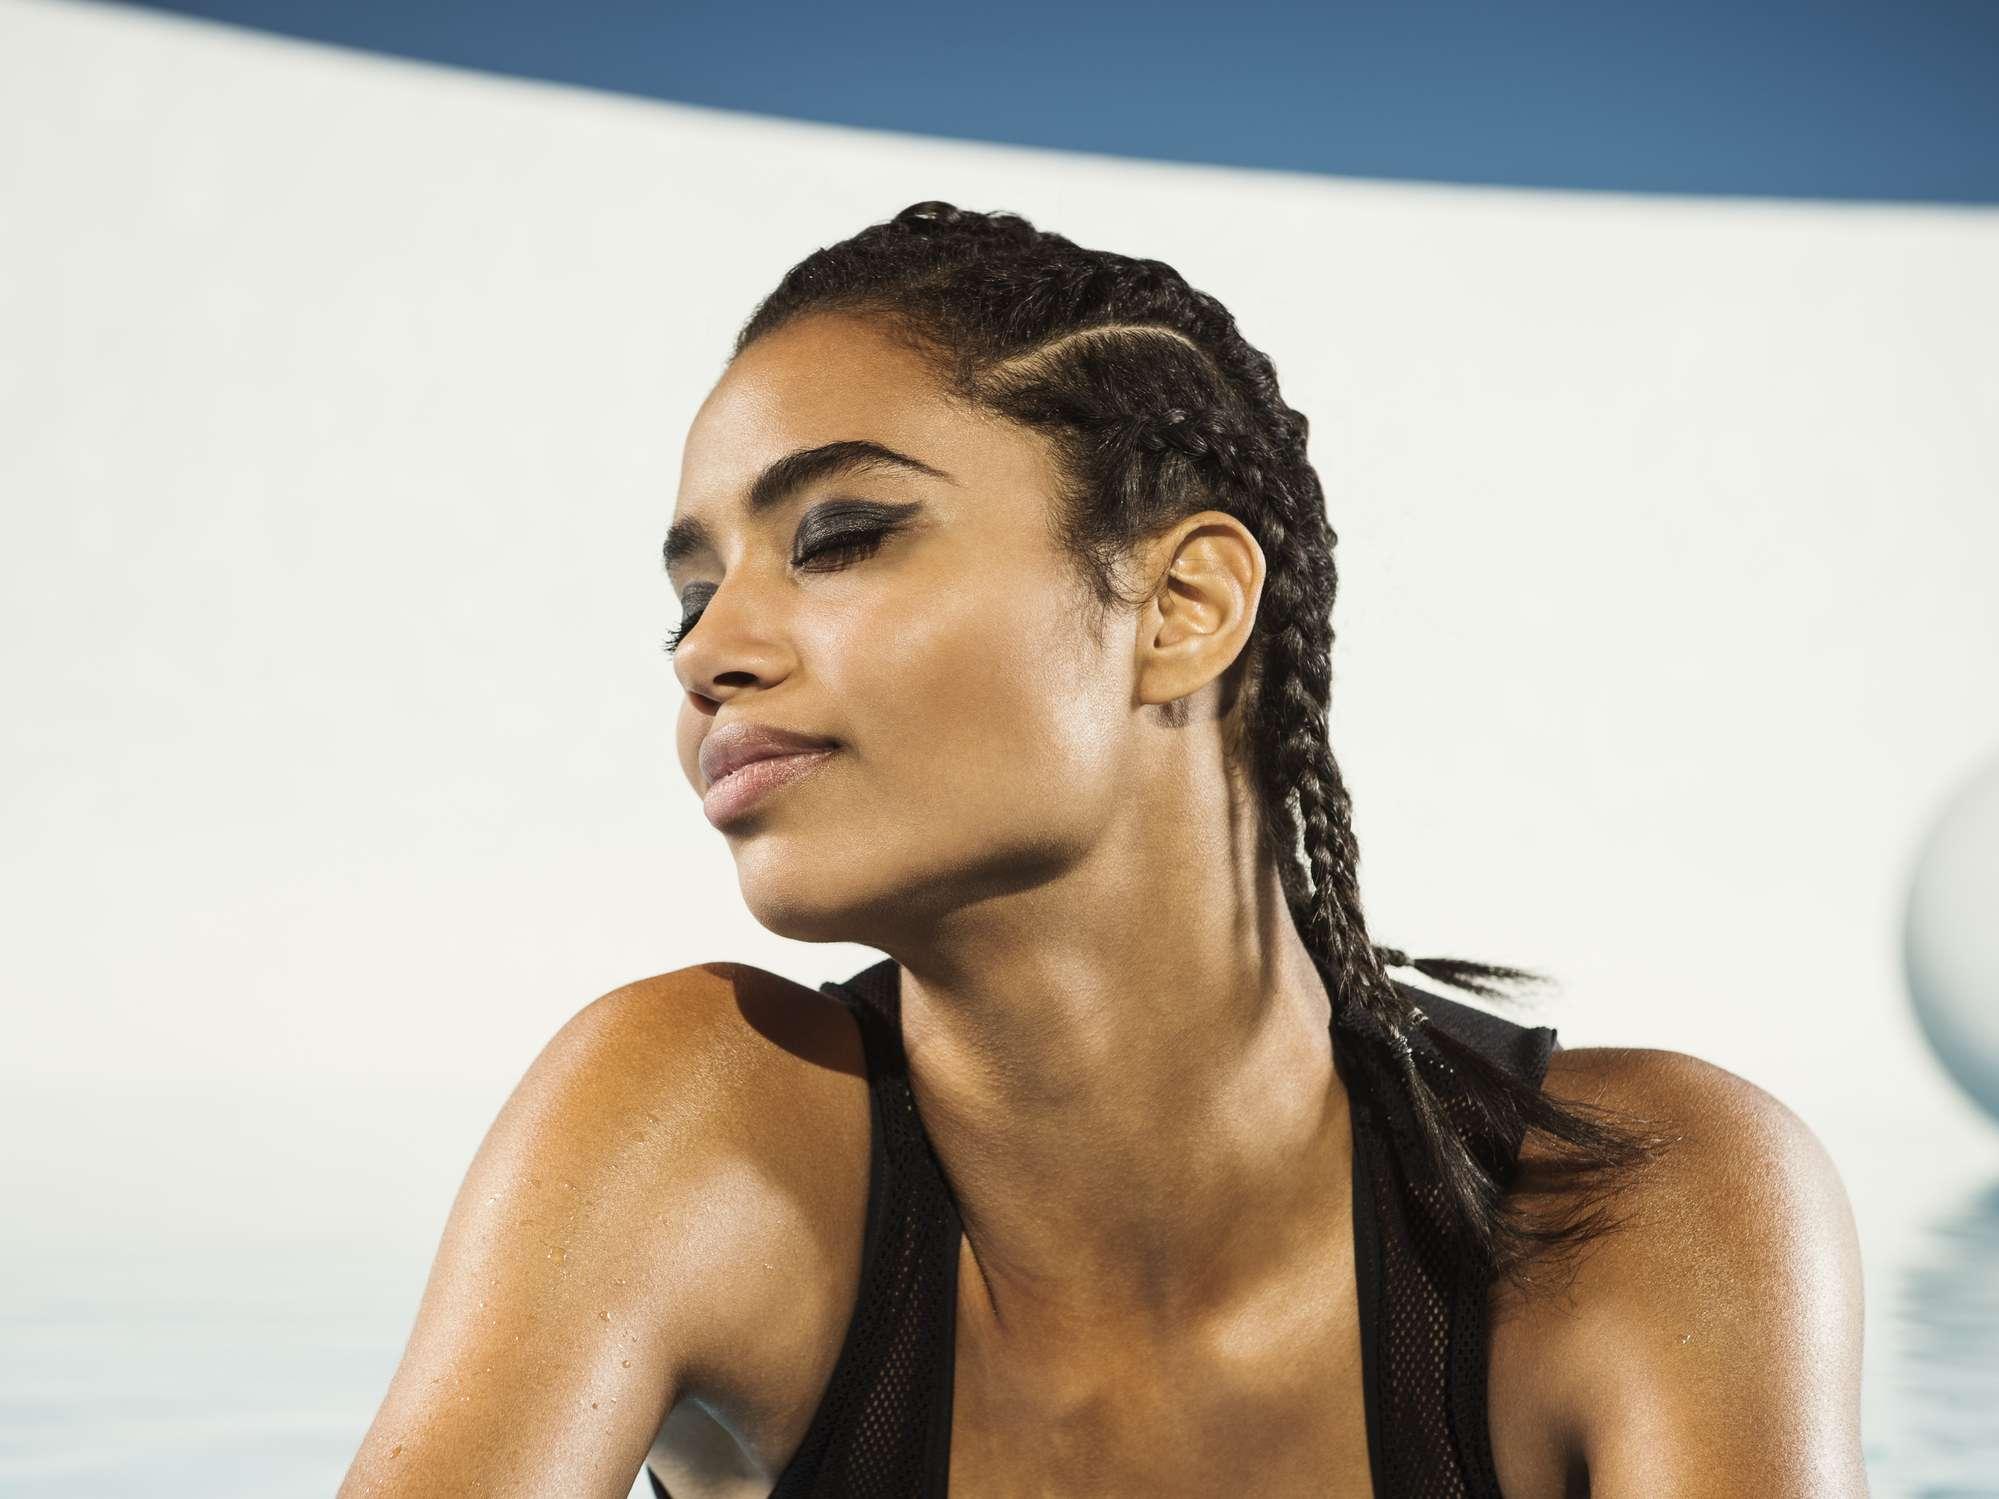 2cbe261d0e53a 5 Winter Hair Care Tips for Black Hair